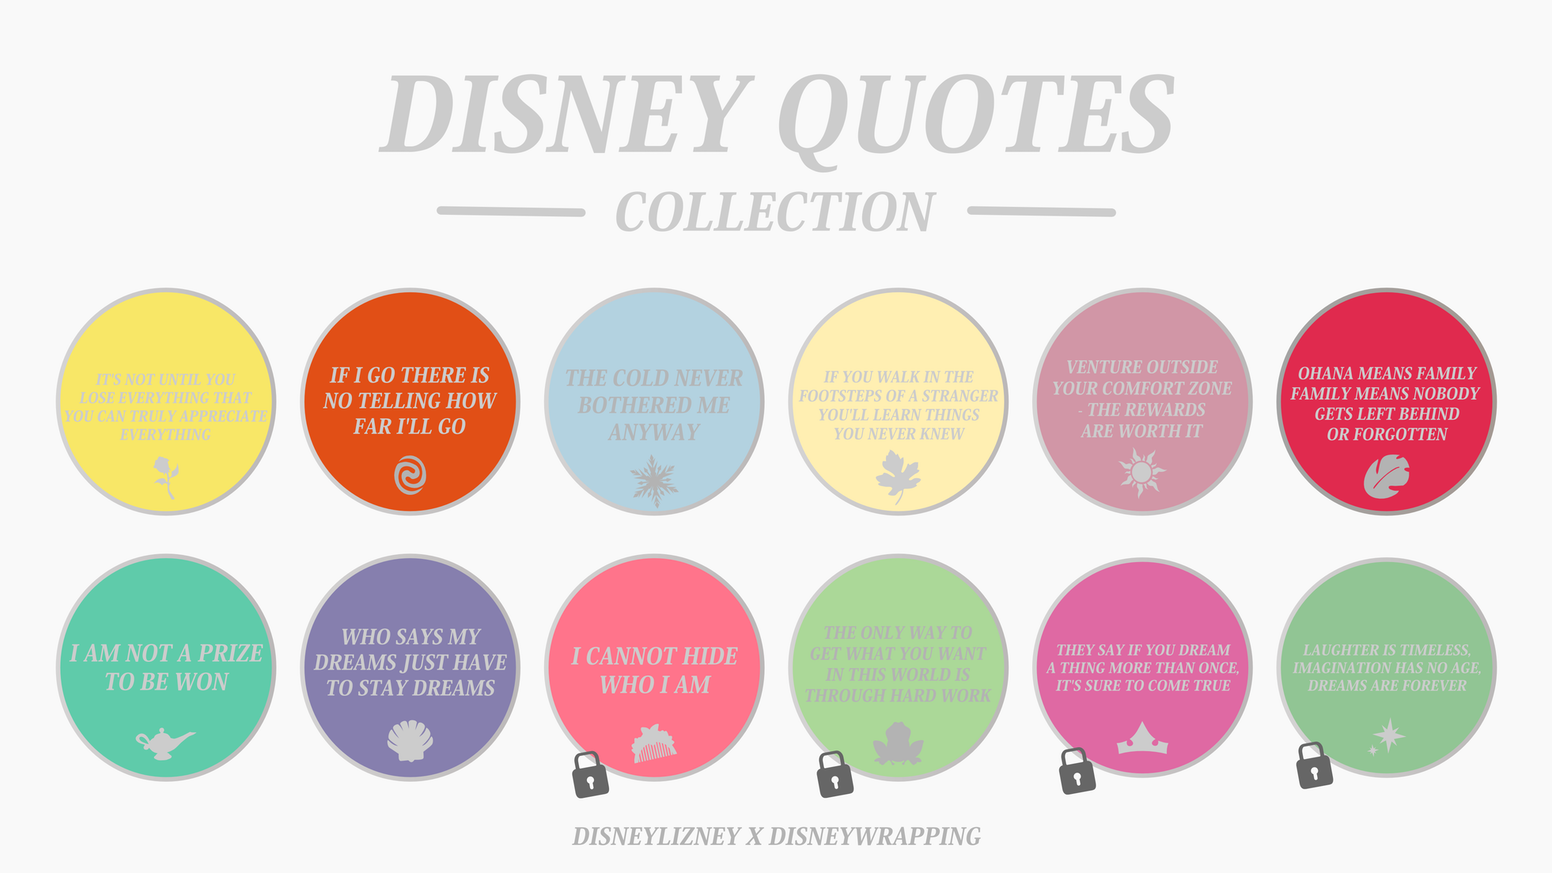 Disney Quotes Collection by DISNEYLIZNEY X DISNEYWRAPPING by ...